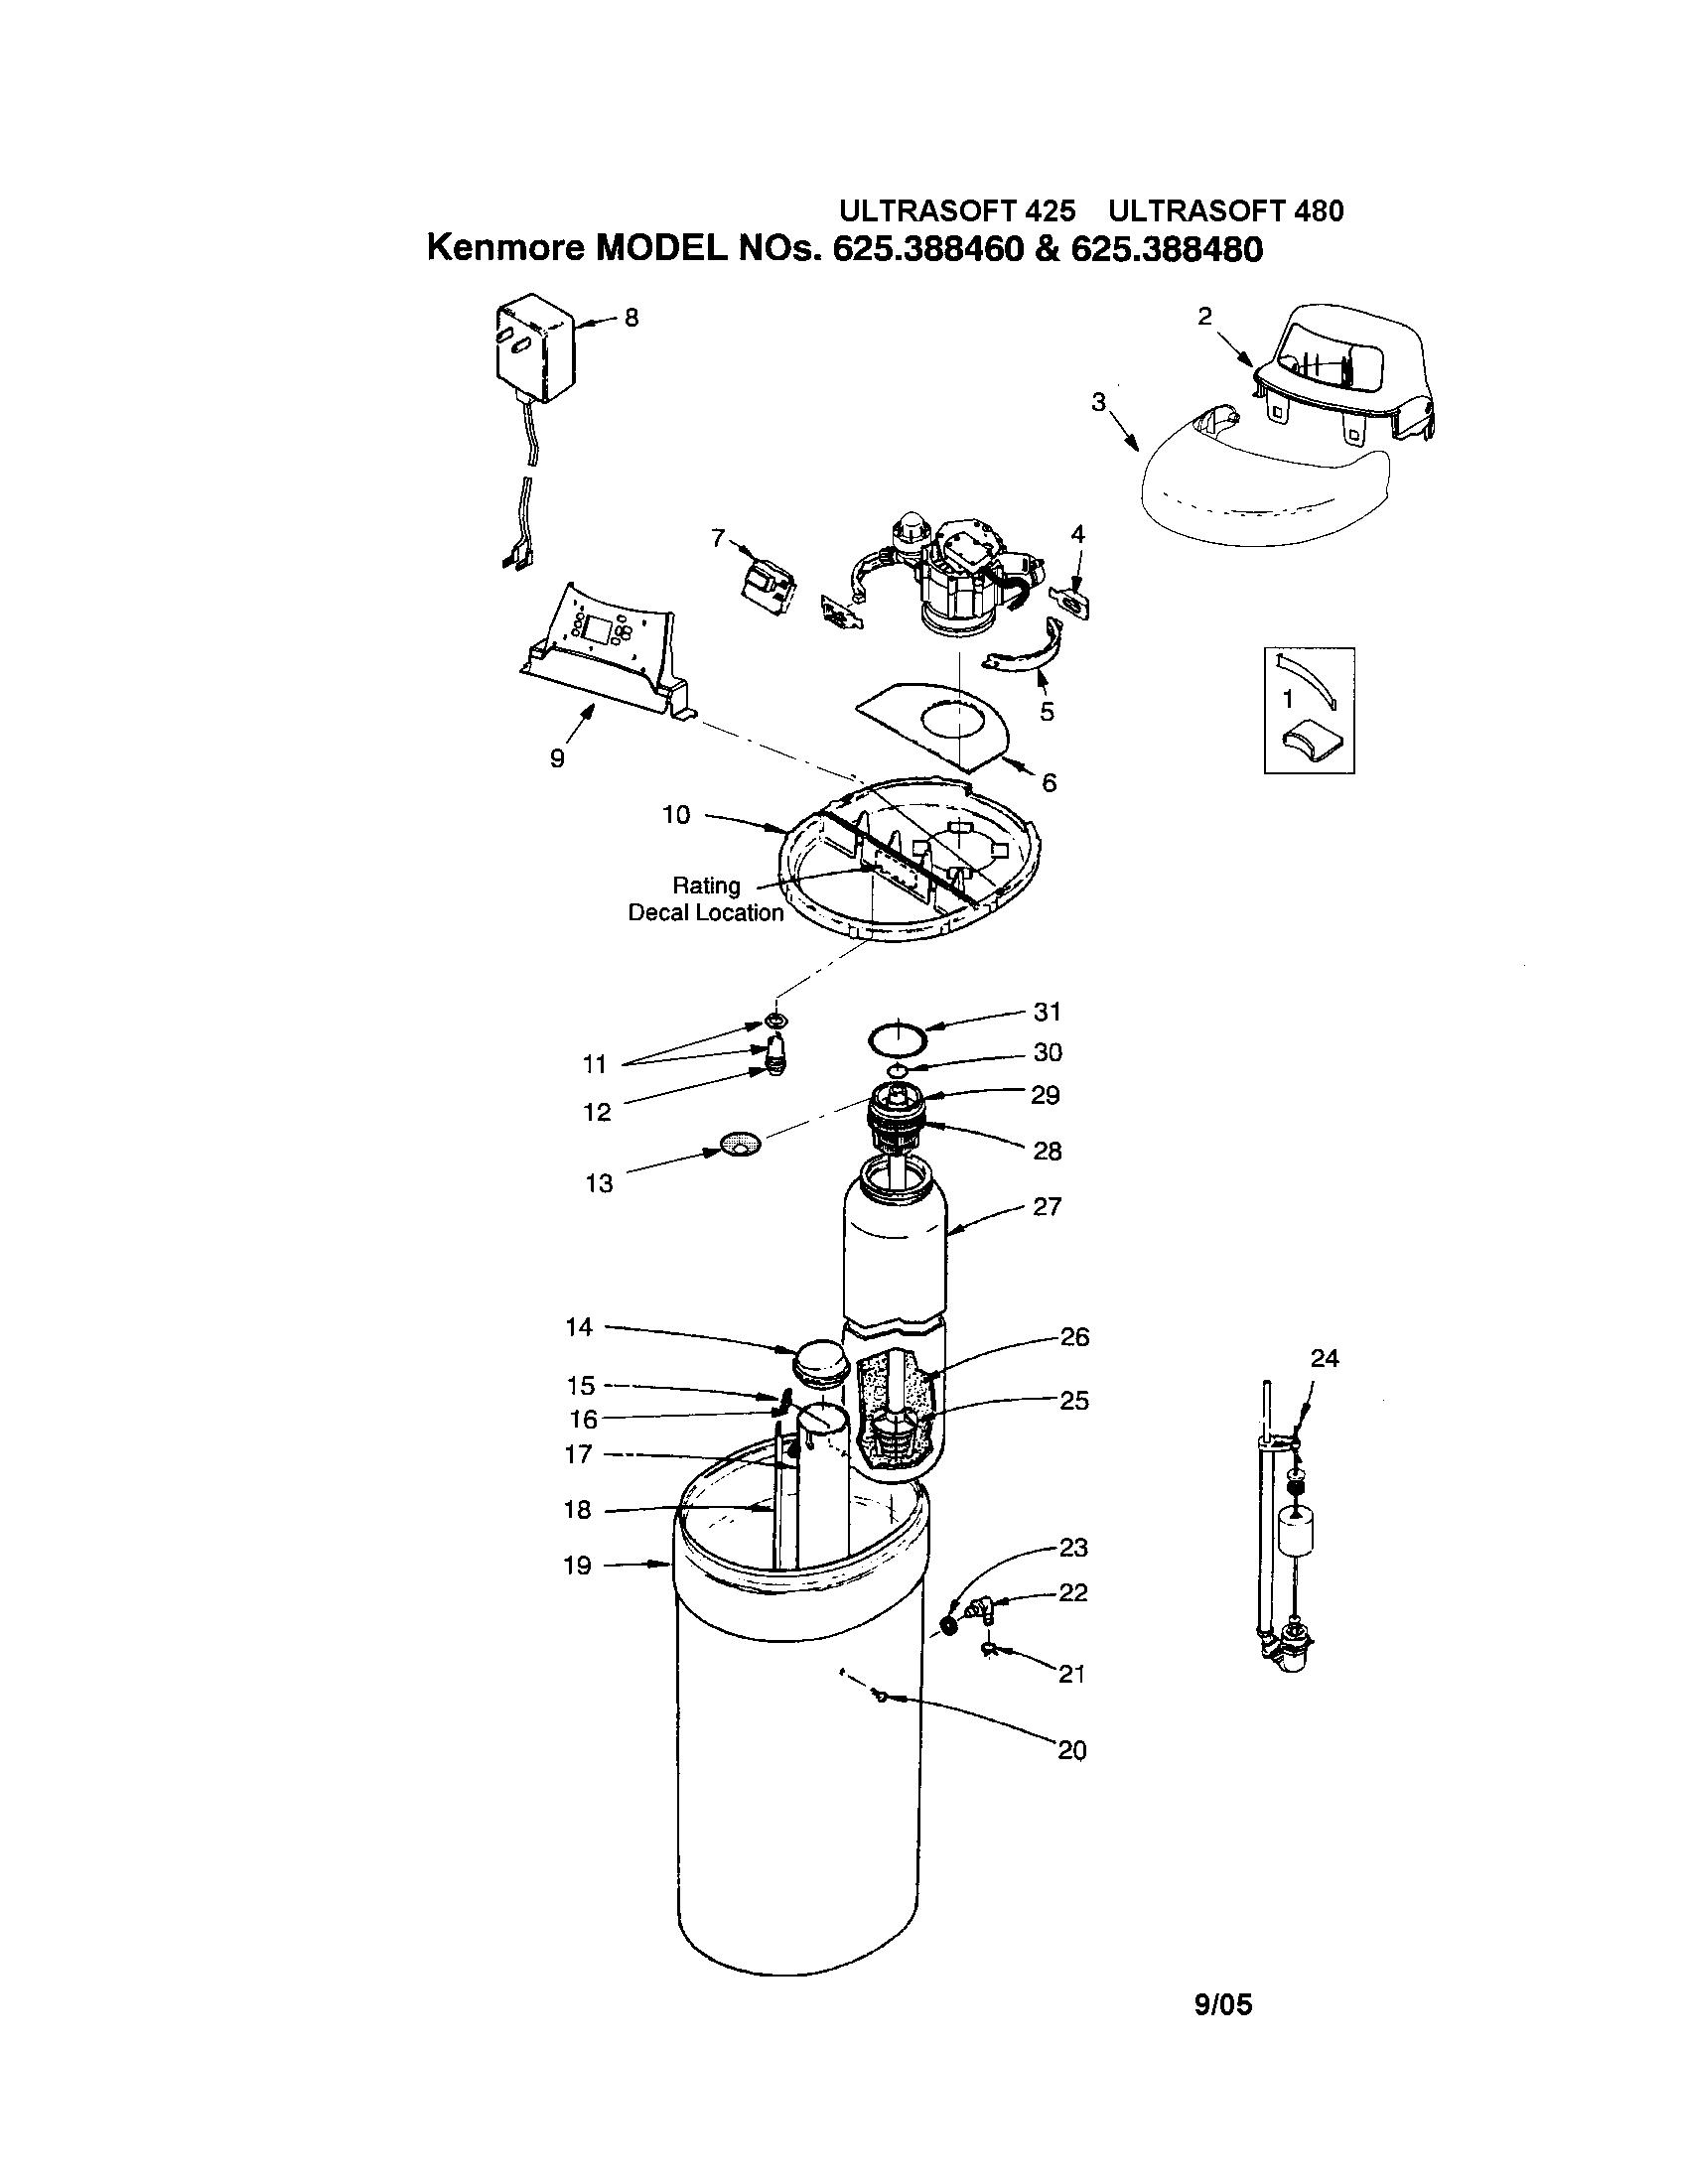 culligan water softener parts diagram fully labeled human skeleton kenmore model 625388460 sears